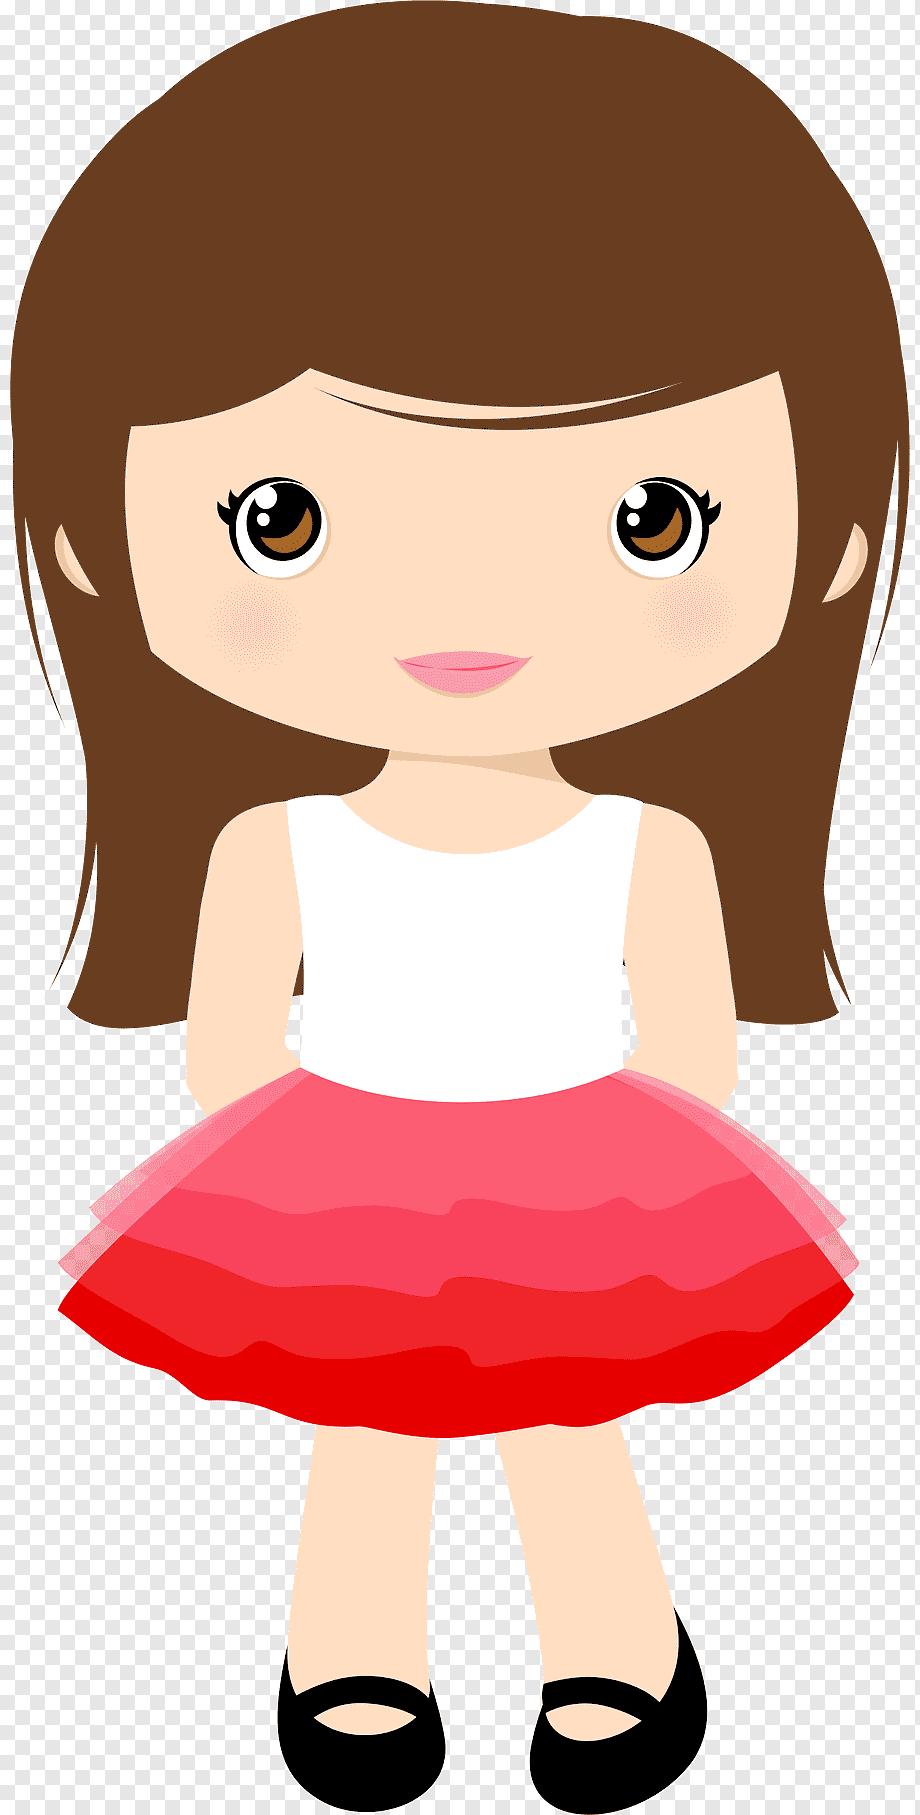 Animasi Anak Perempuan : animasi, perempuan, Child,, Hello, Autumn,, Face,, Fashion, PNGWing